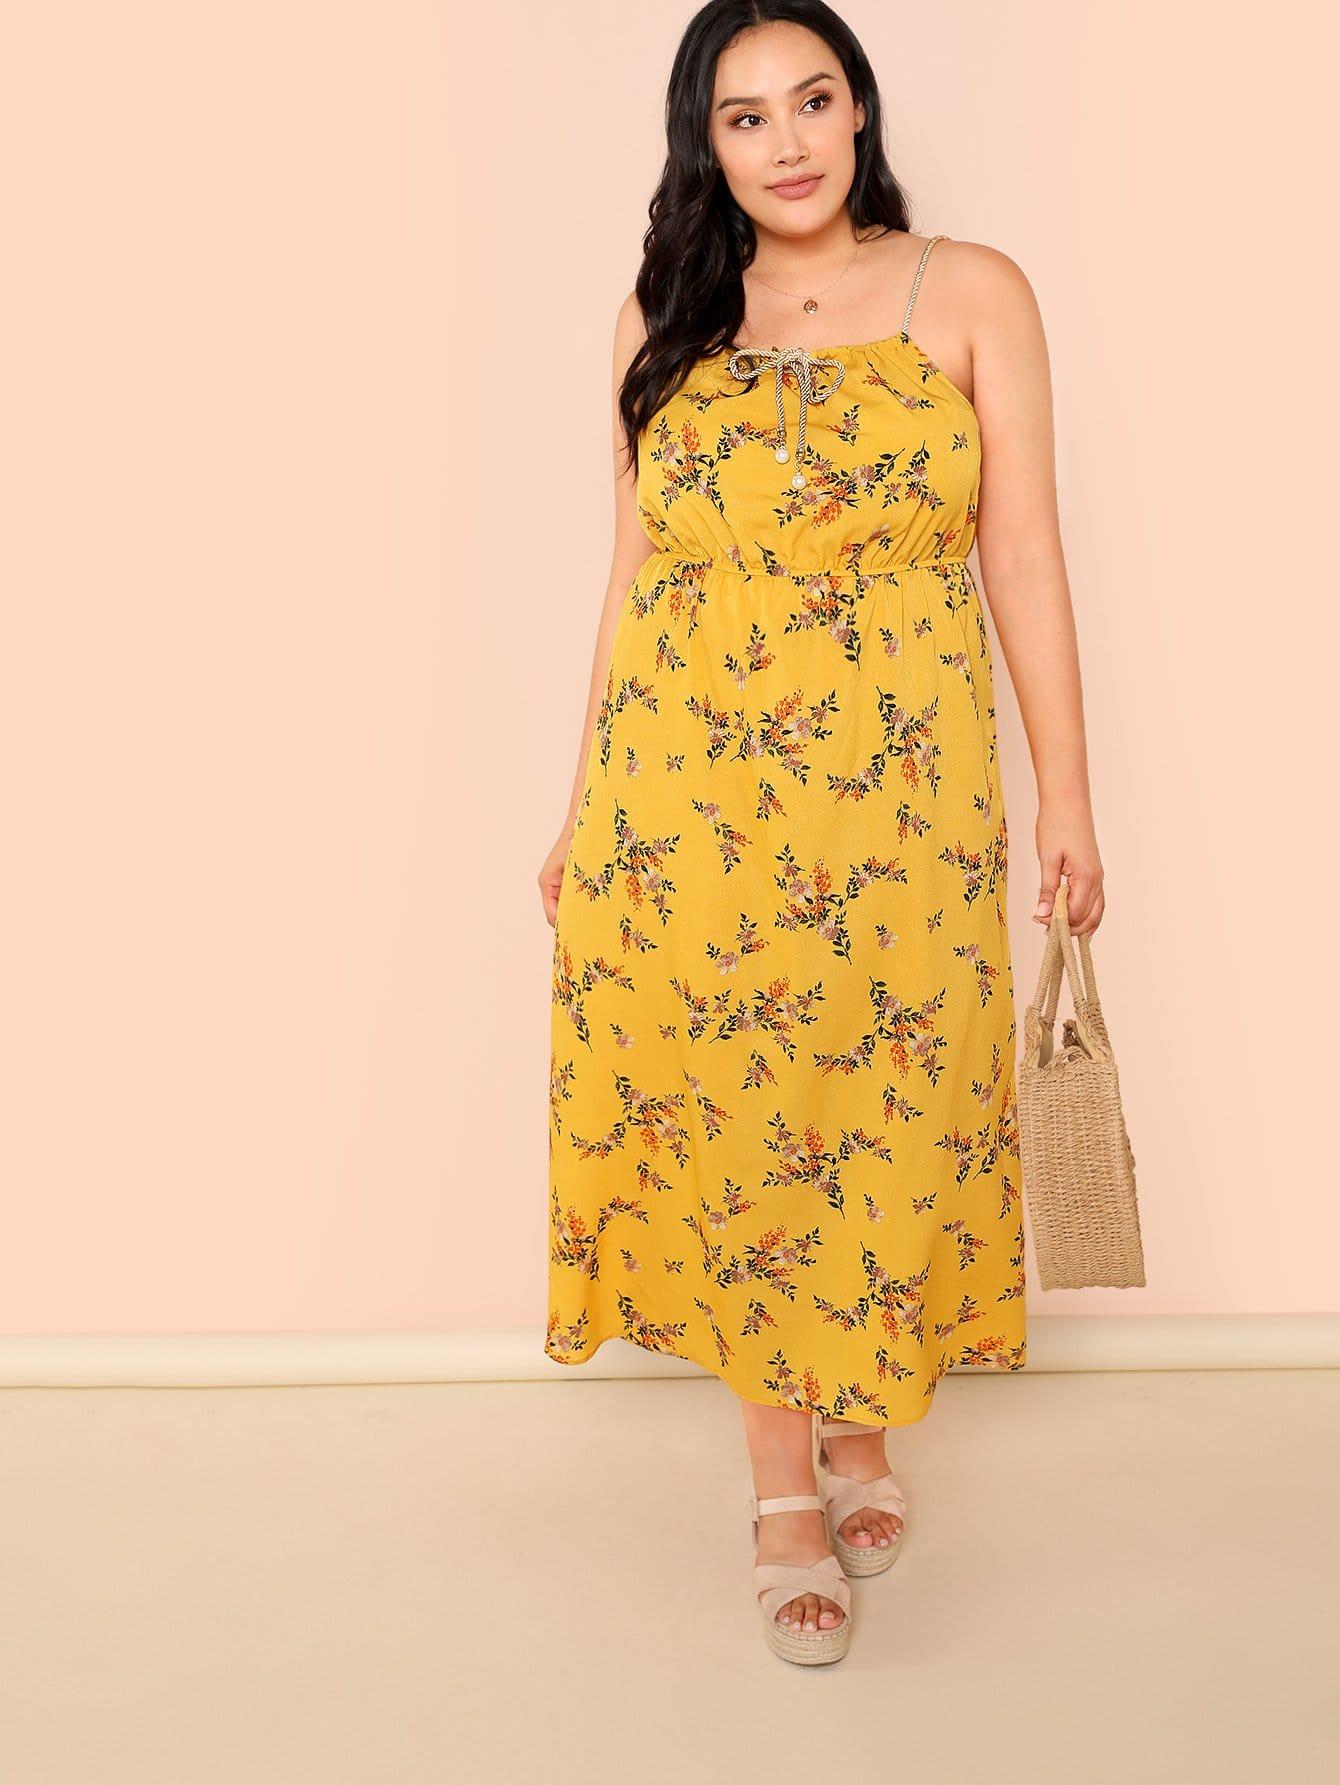 Calico Print Drawstring Cami Dress calico print faux pearl detail cami dress